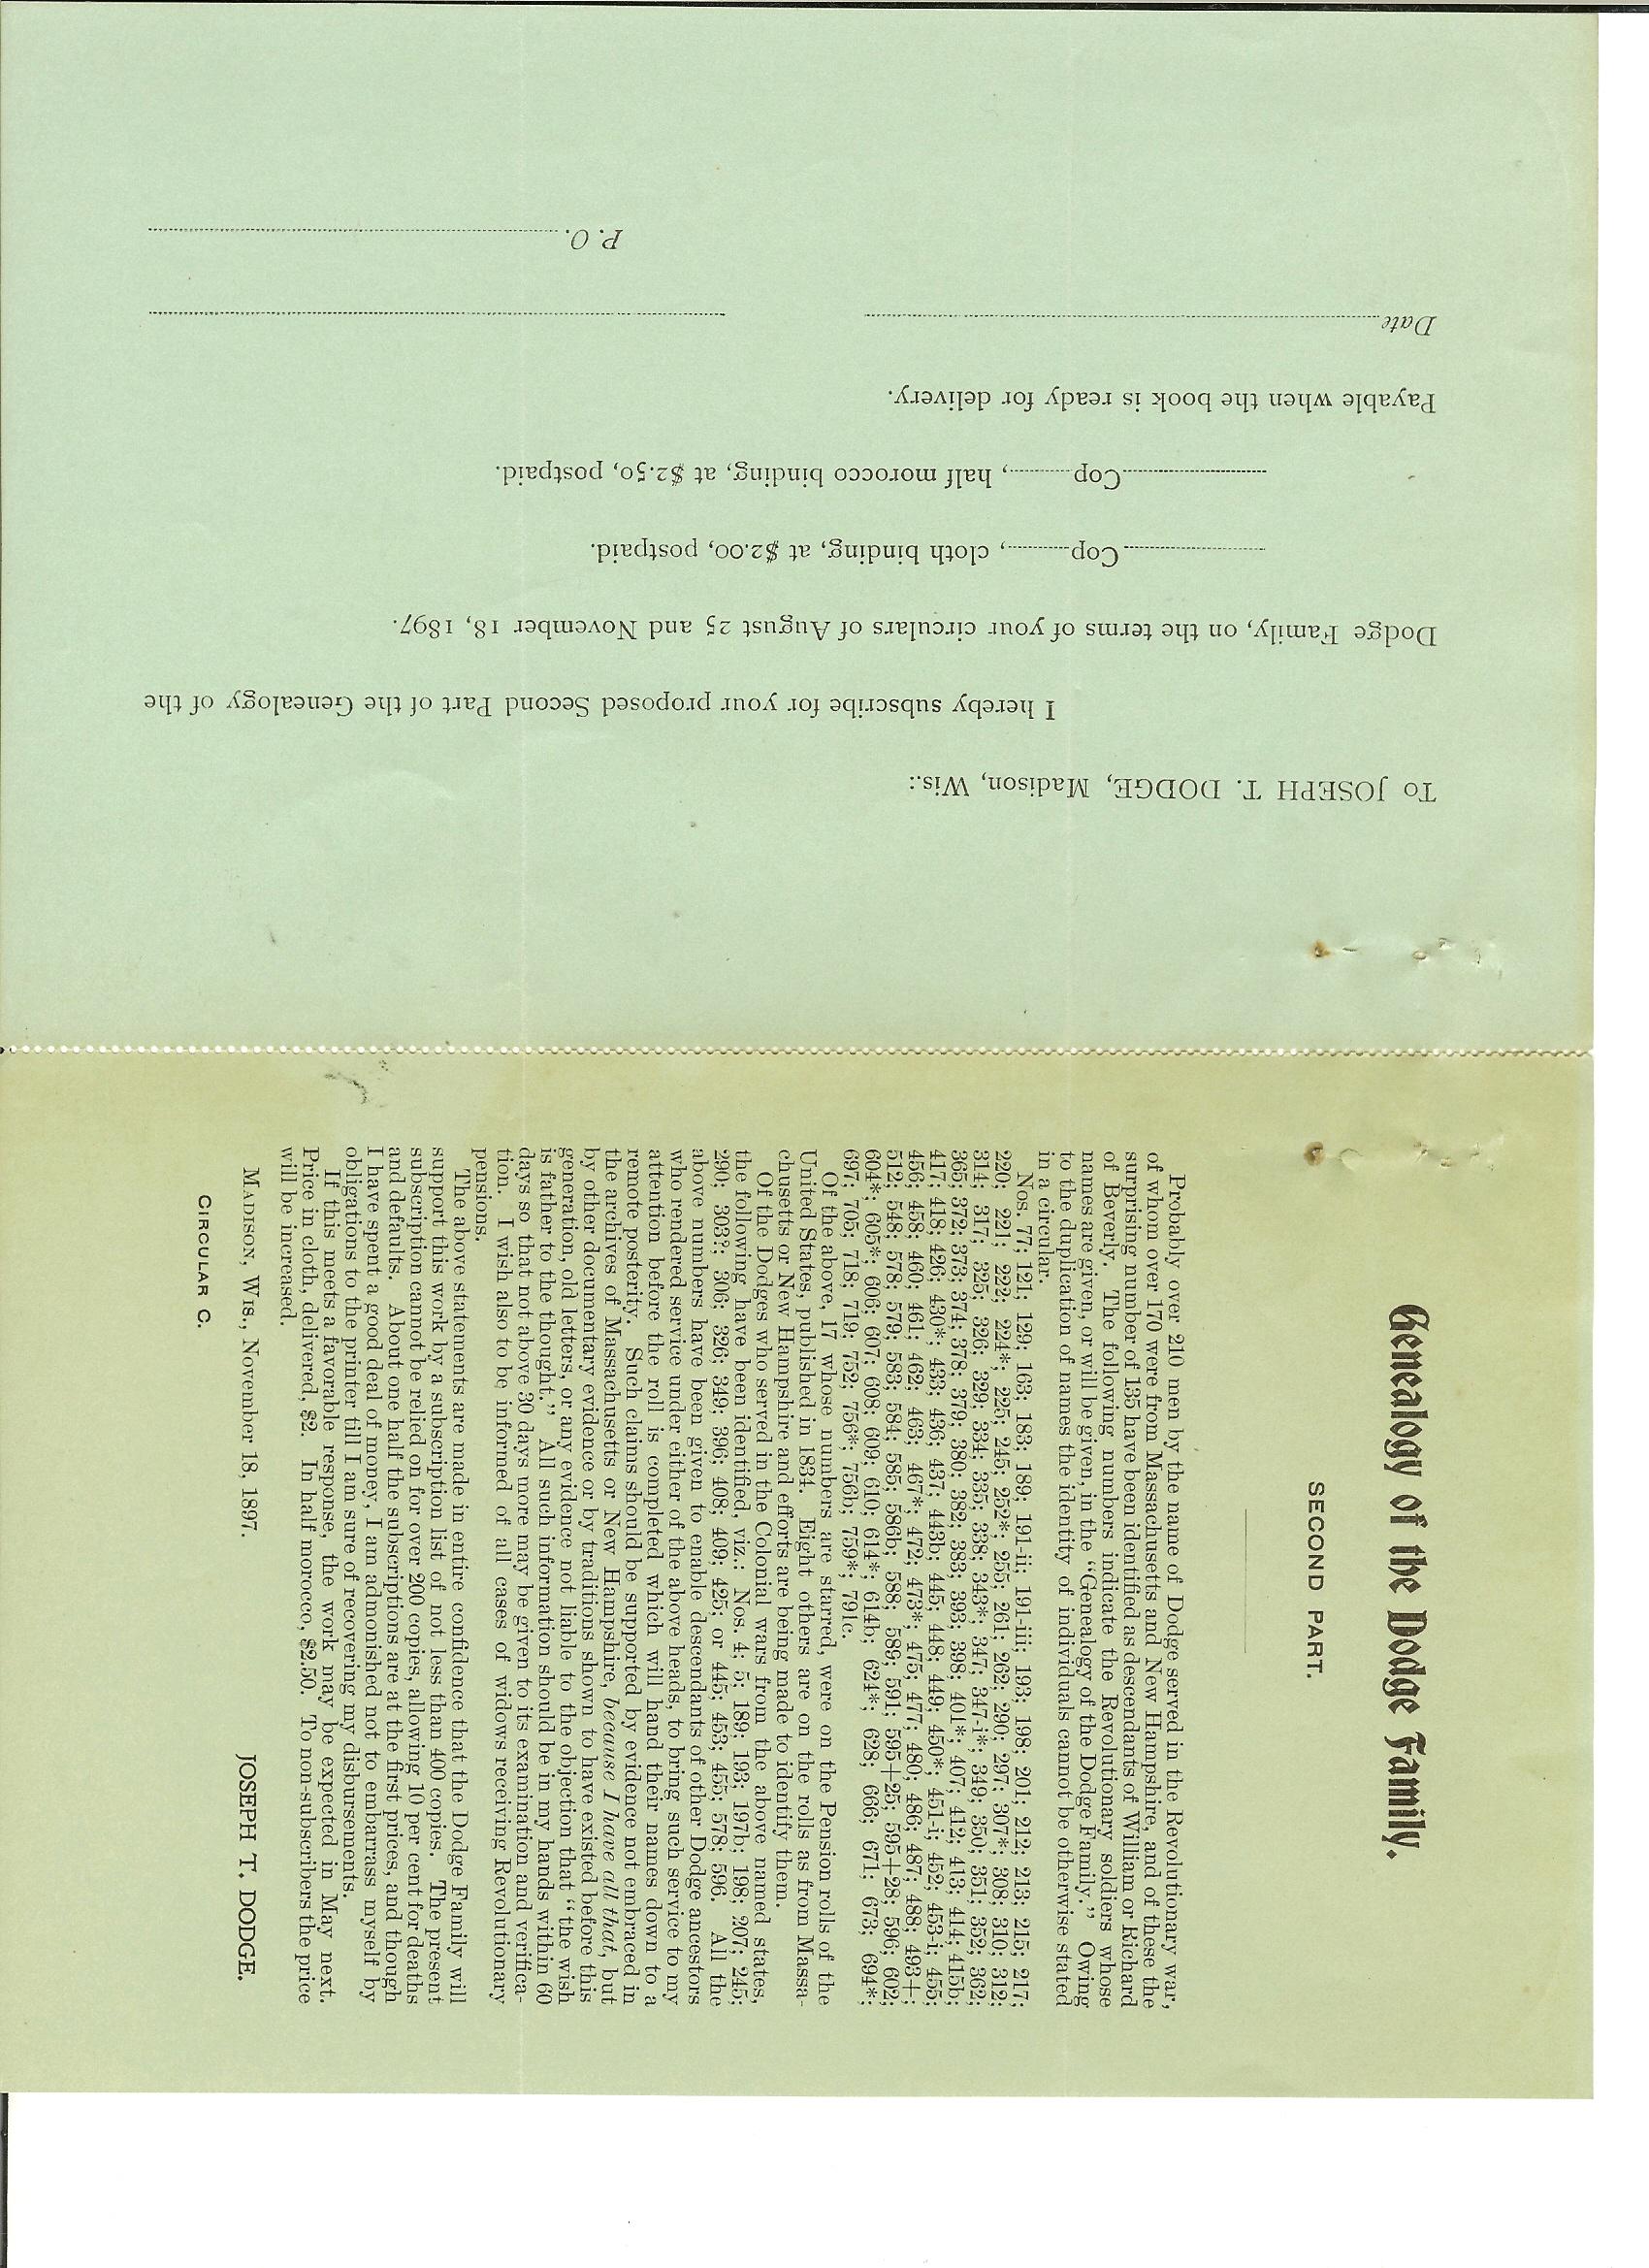 Index Of Genealogy MarthaAnnDodgeLetters Etc